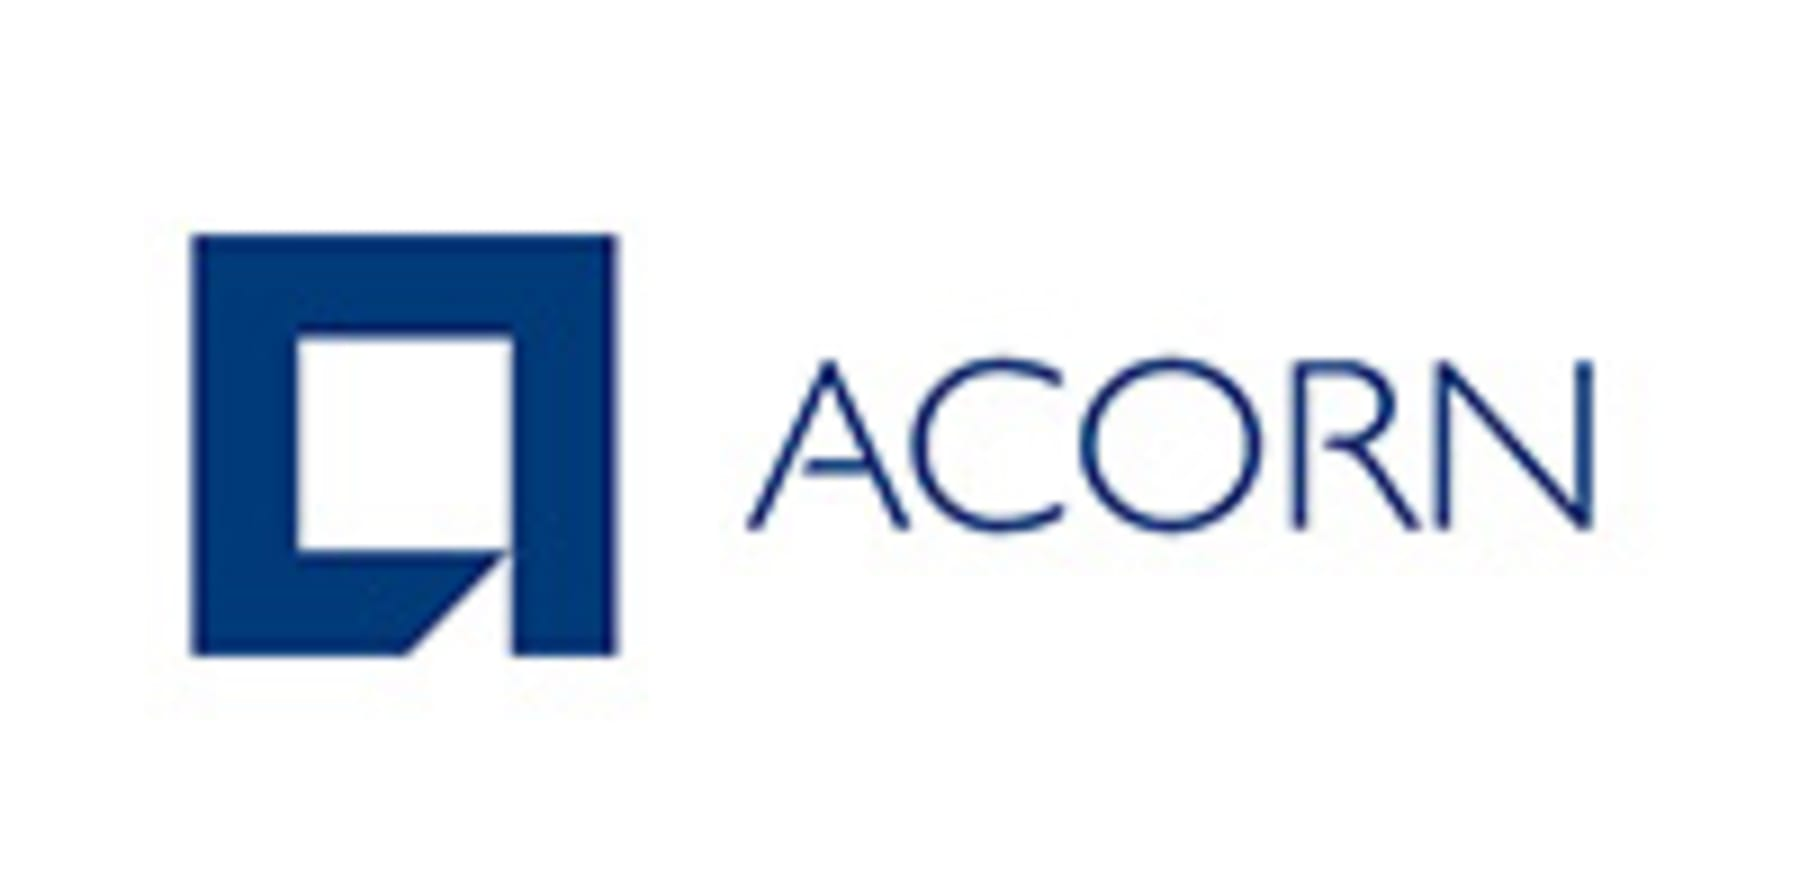 Acorn Blue